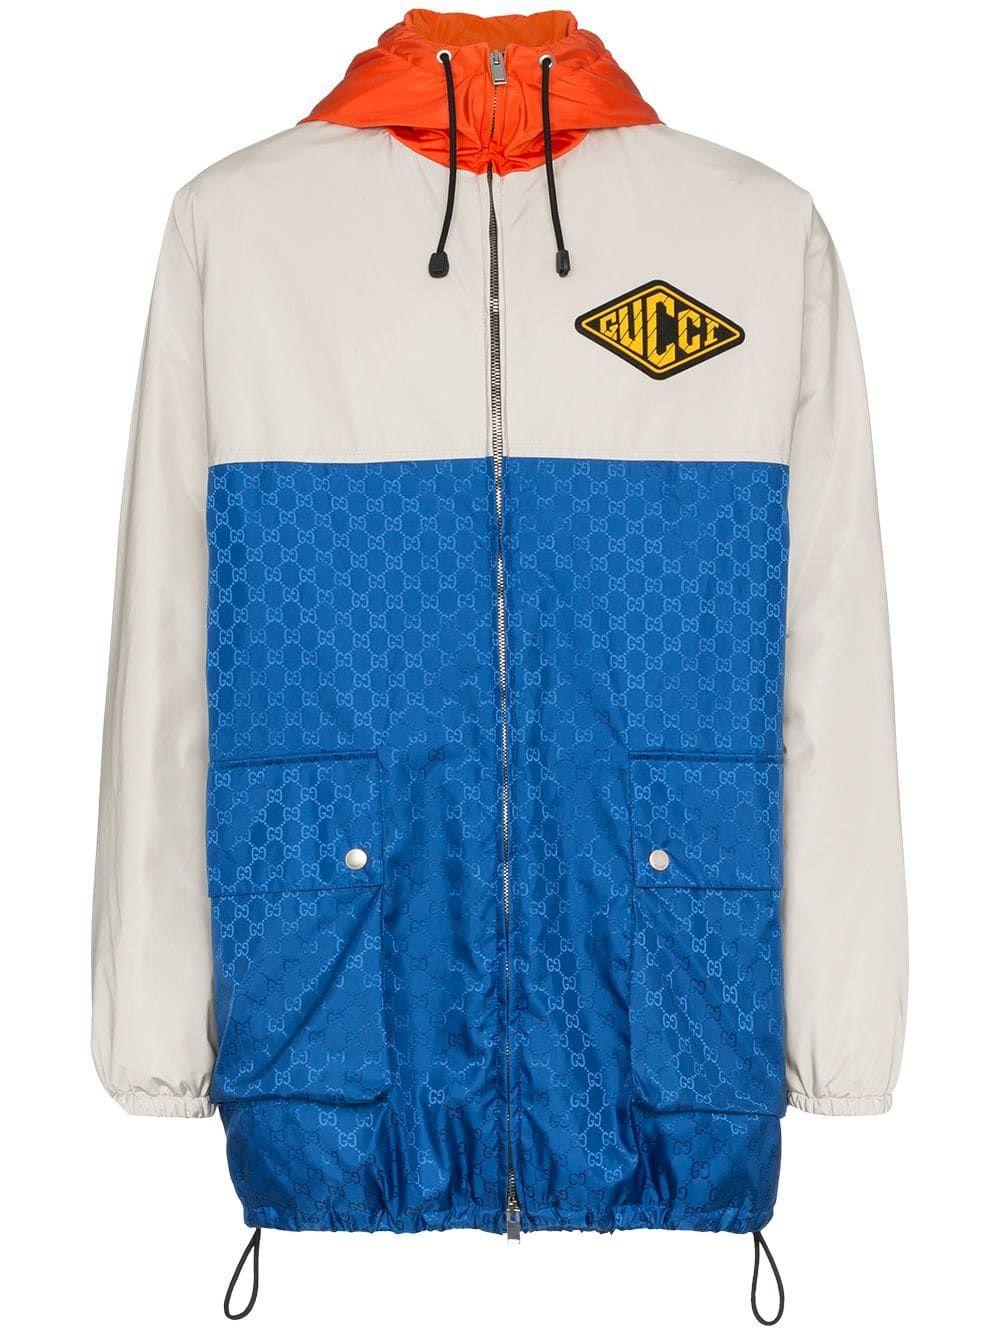 Gucci Gg Jacquard Logo Hooded Jacket Farfetch Hooded Jacket Jackets Outerwear Jackets [ 1334 x 1000 Pixel ]